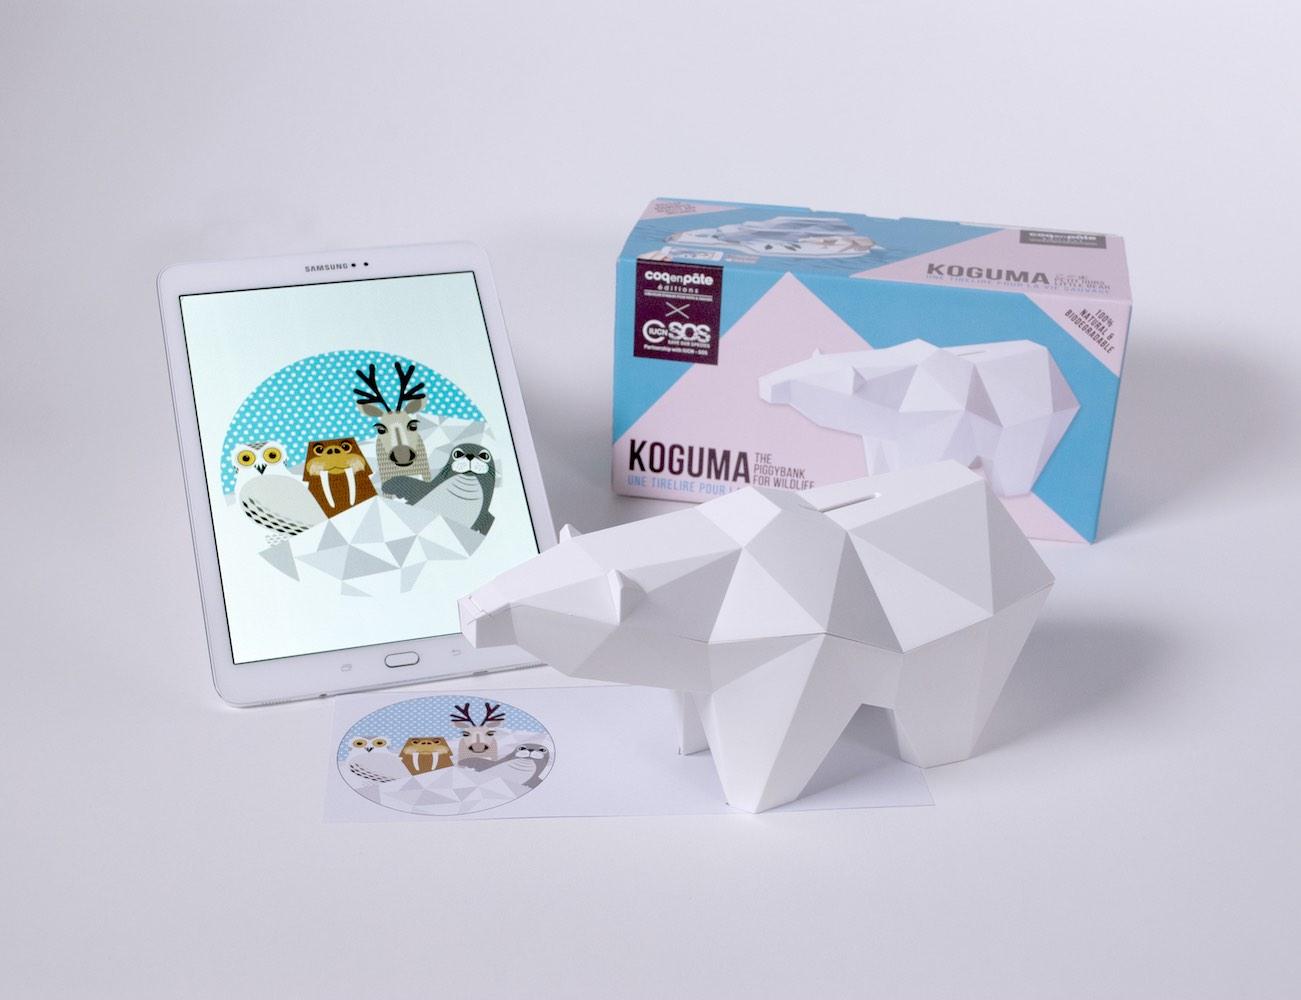 koguma-the-piggybank-for-wildlife-01